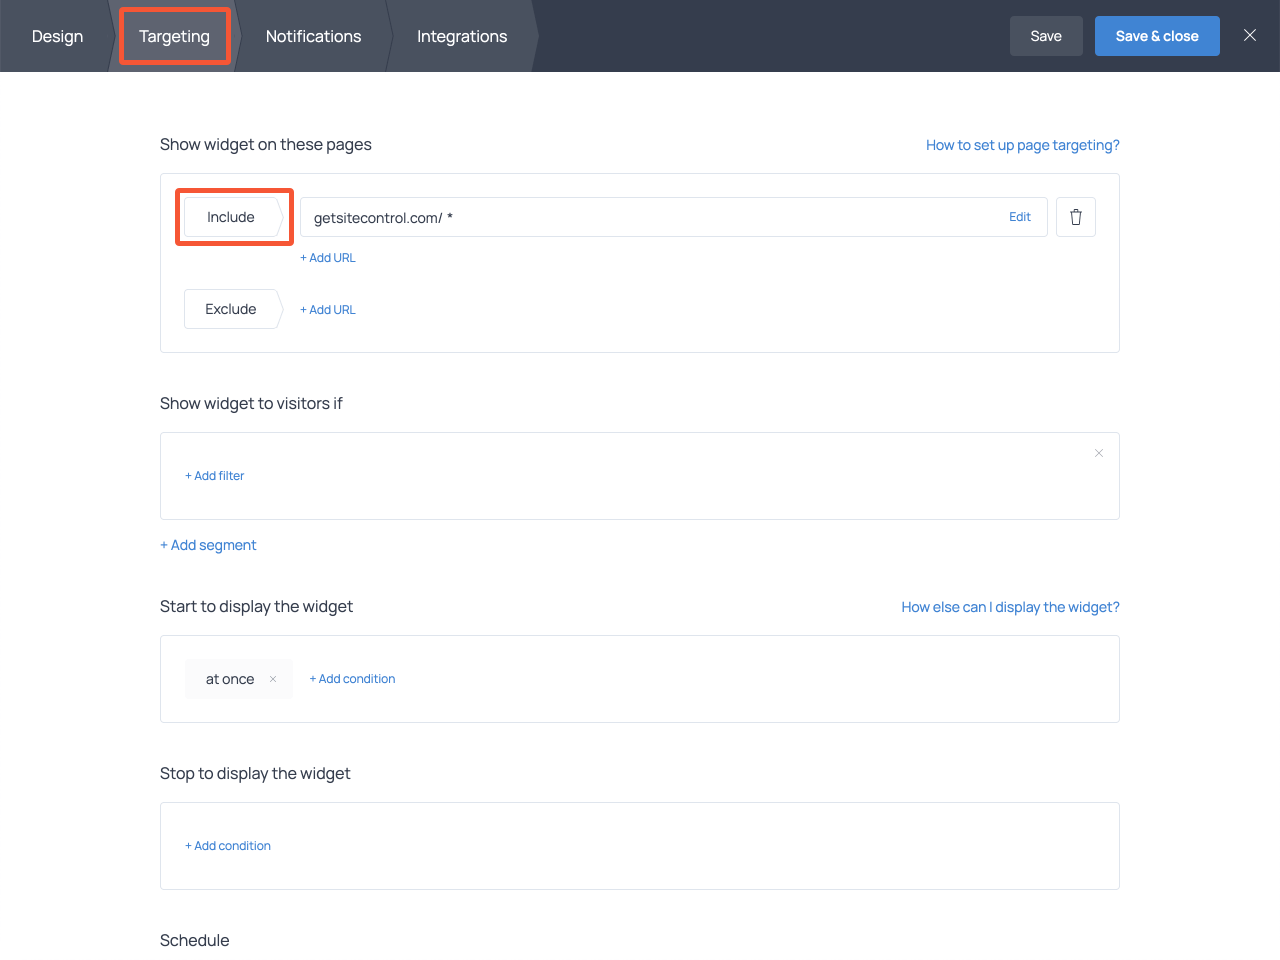 How to adjust targeting settings in Getsitecontrol